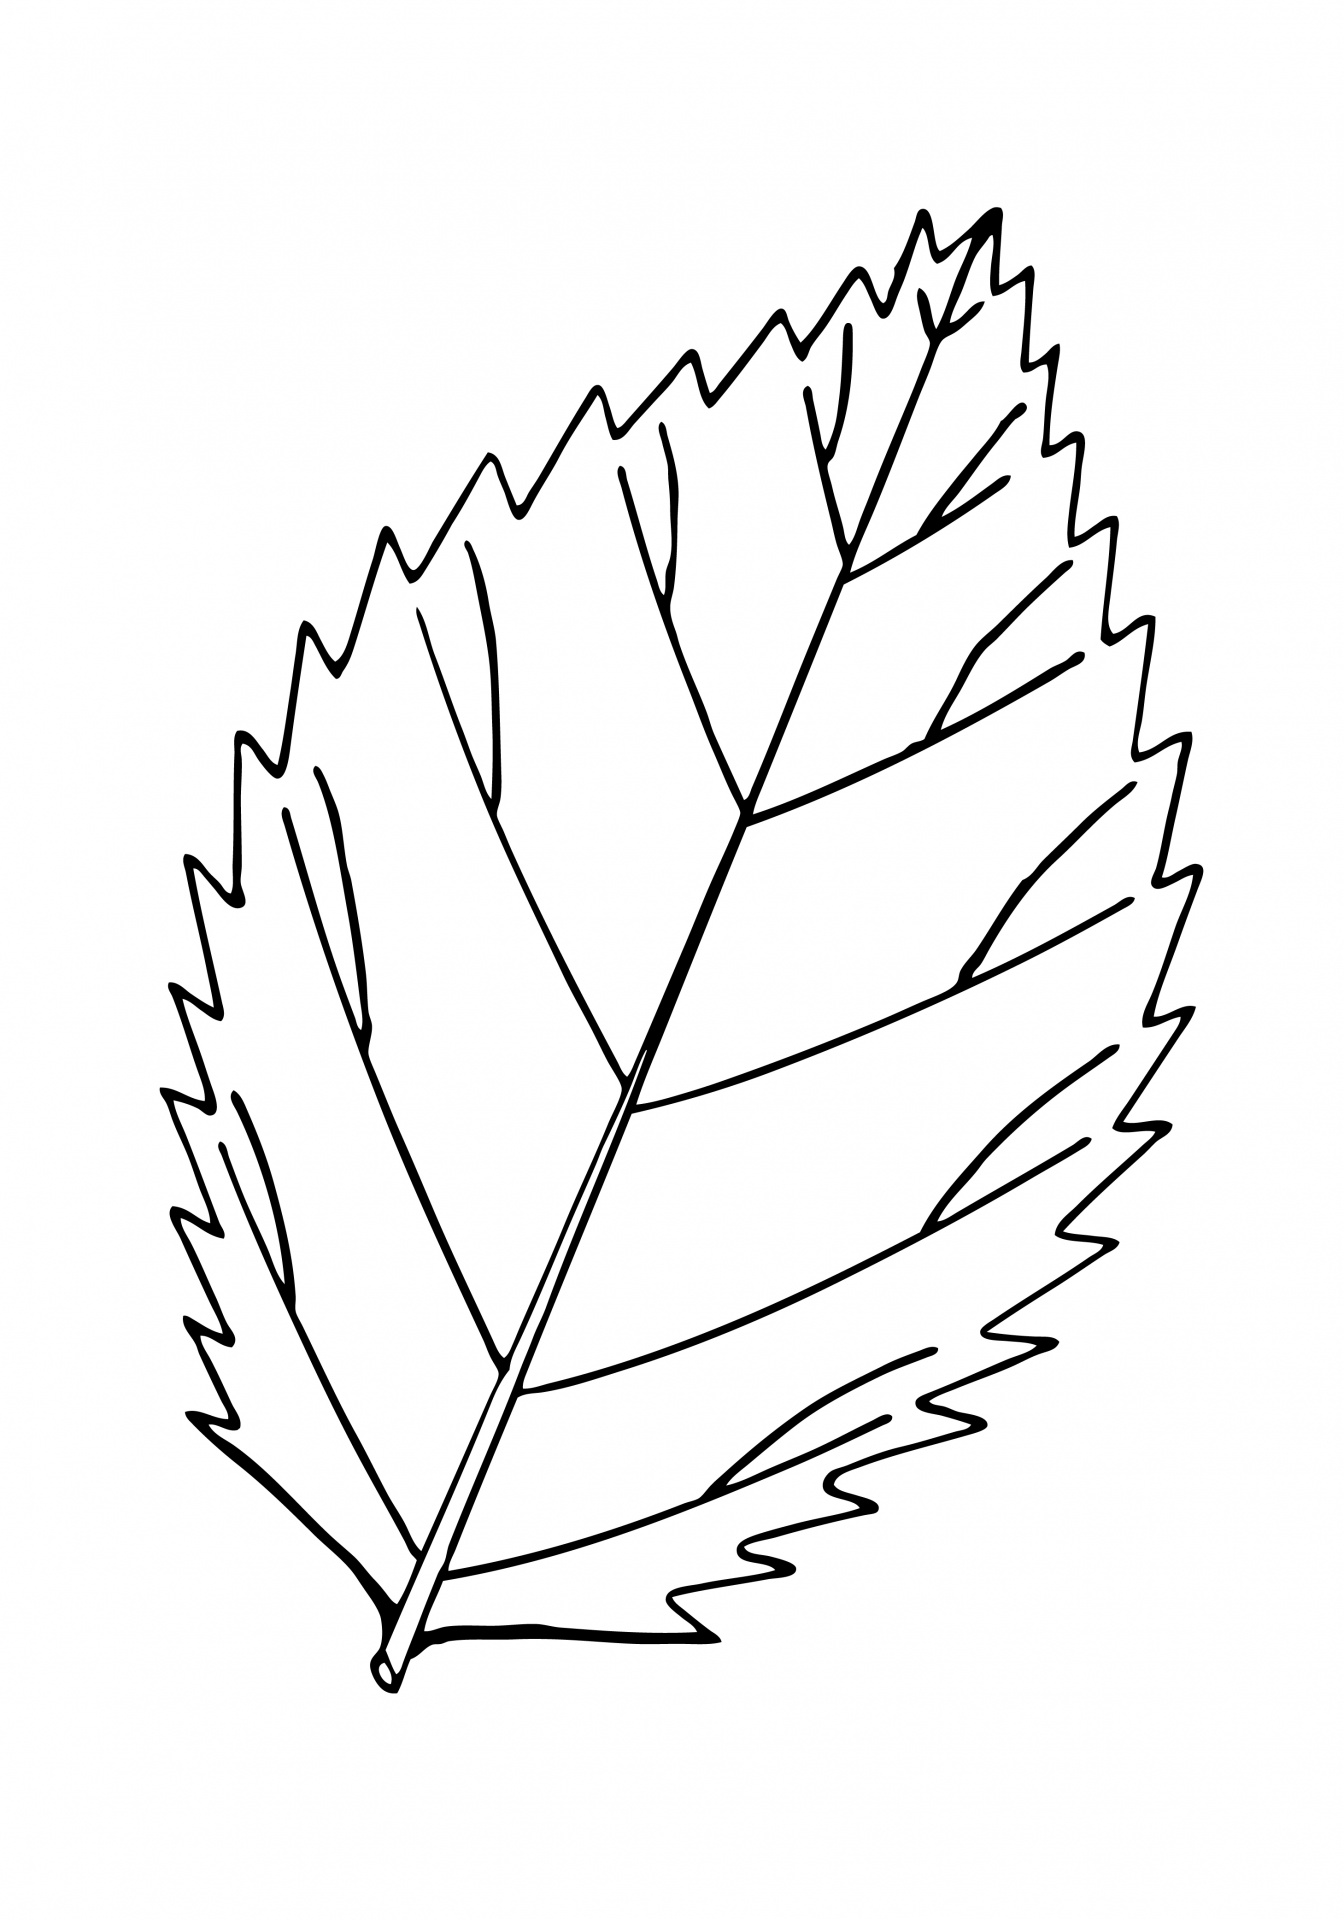 Leaf Outline Clipart Gclipart